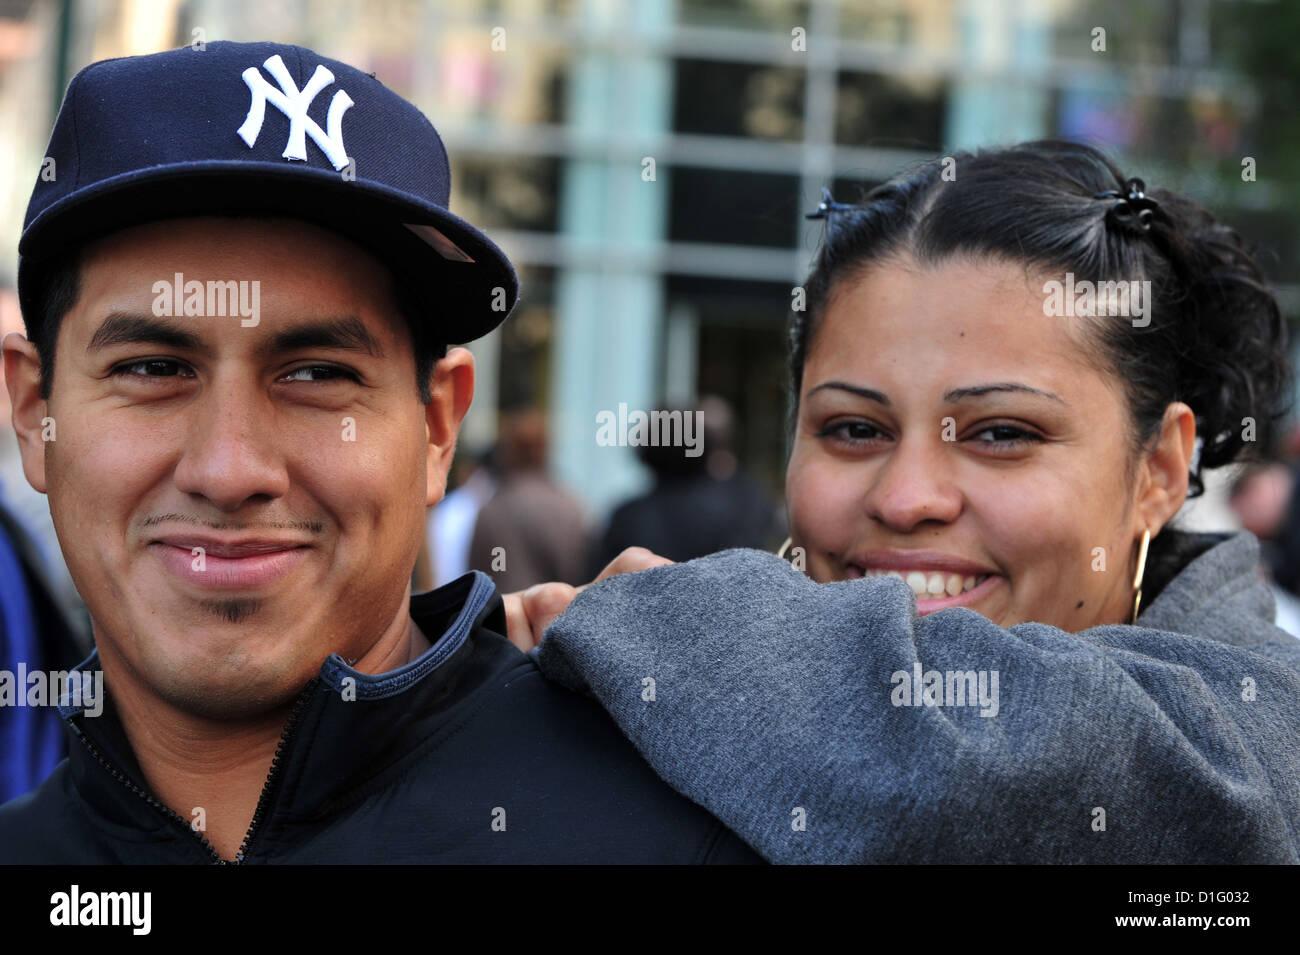 Happy Latino Americans couple in Manhattan New York. - Stock Image